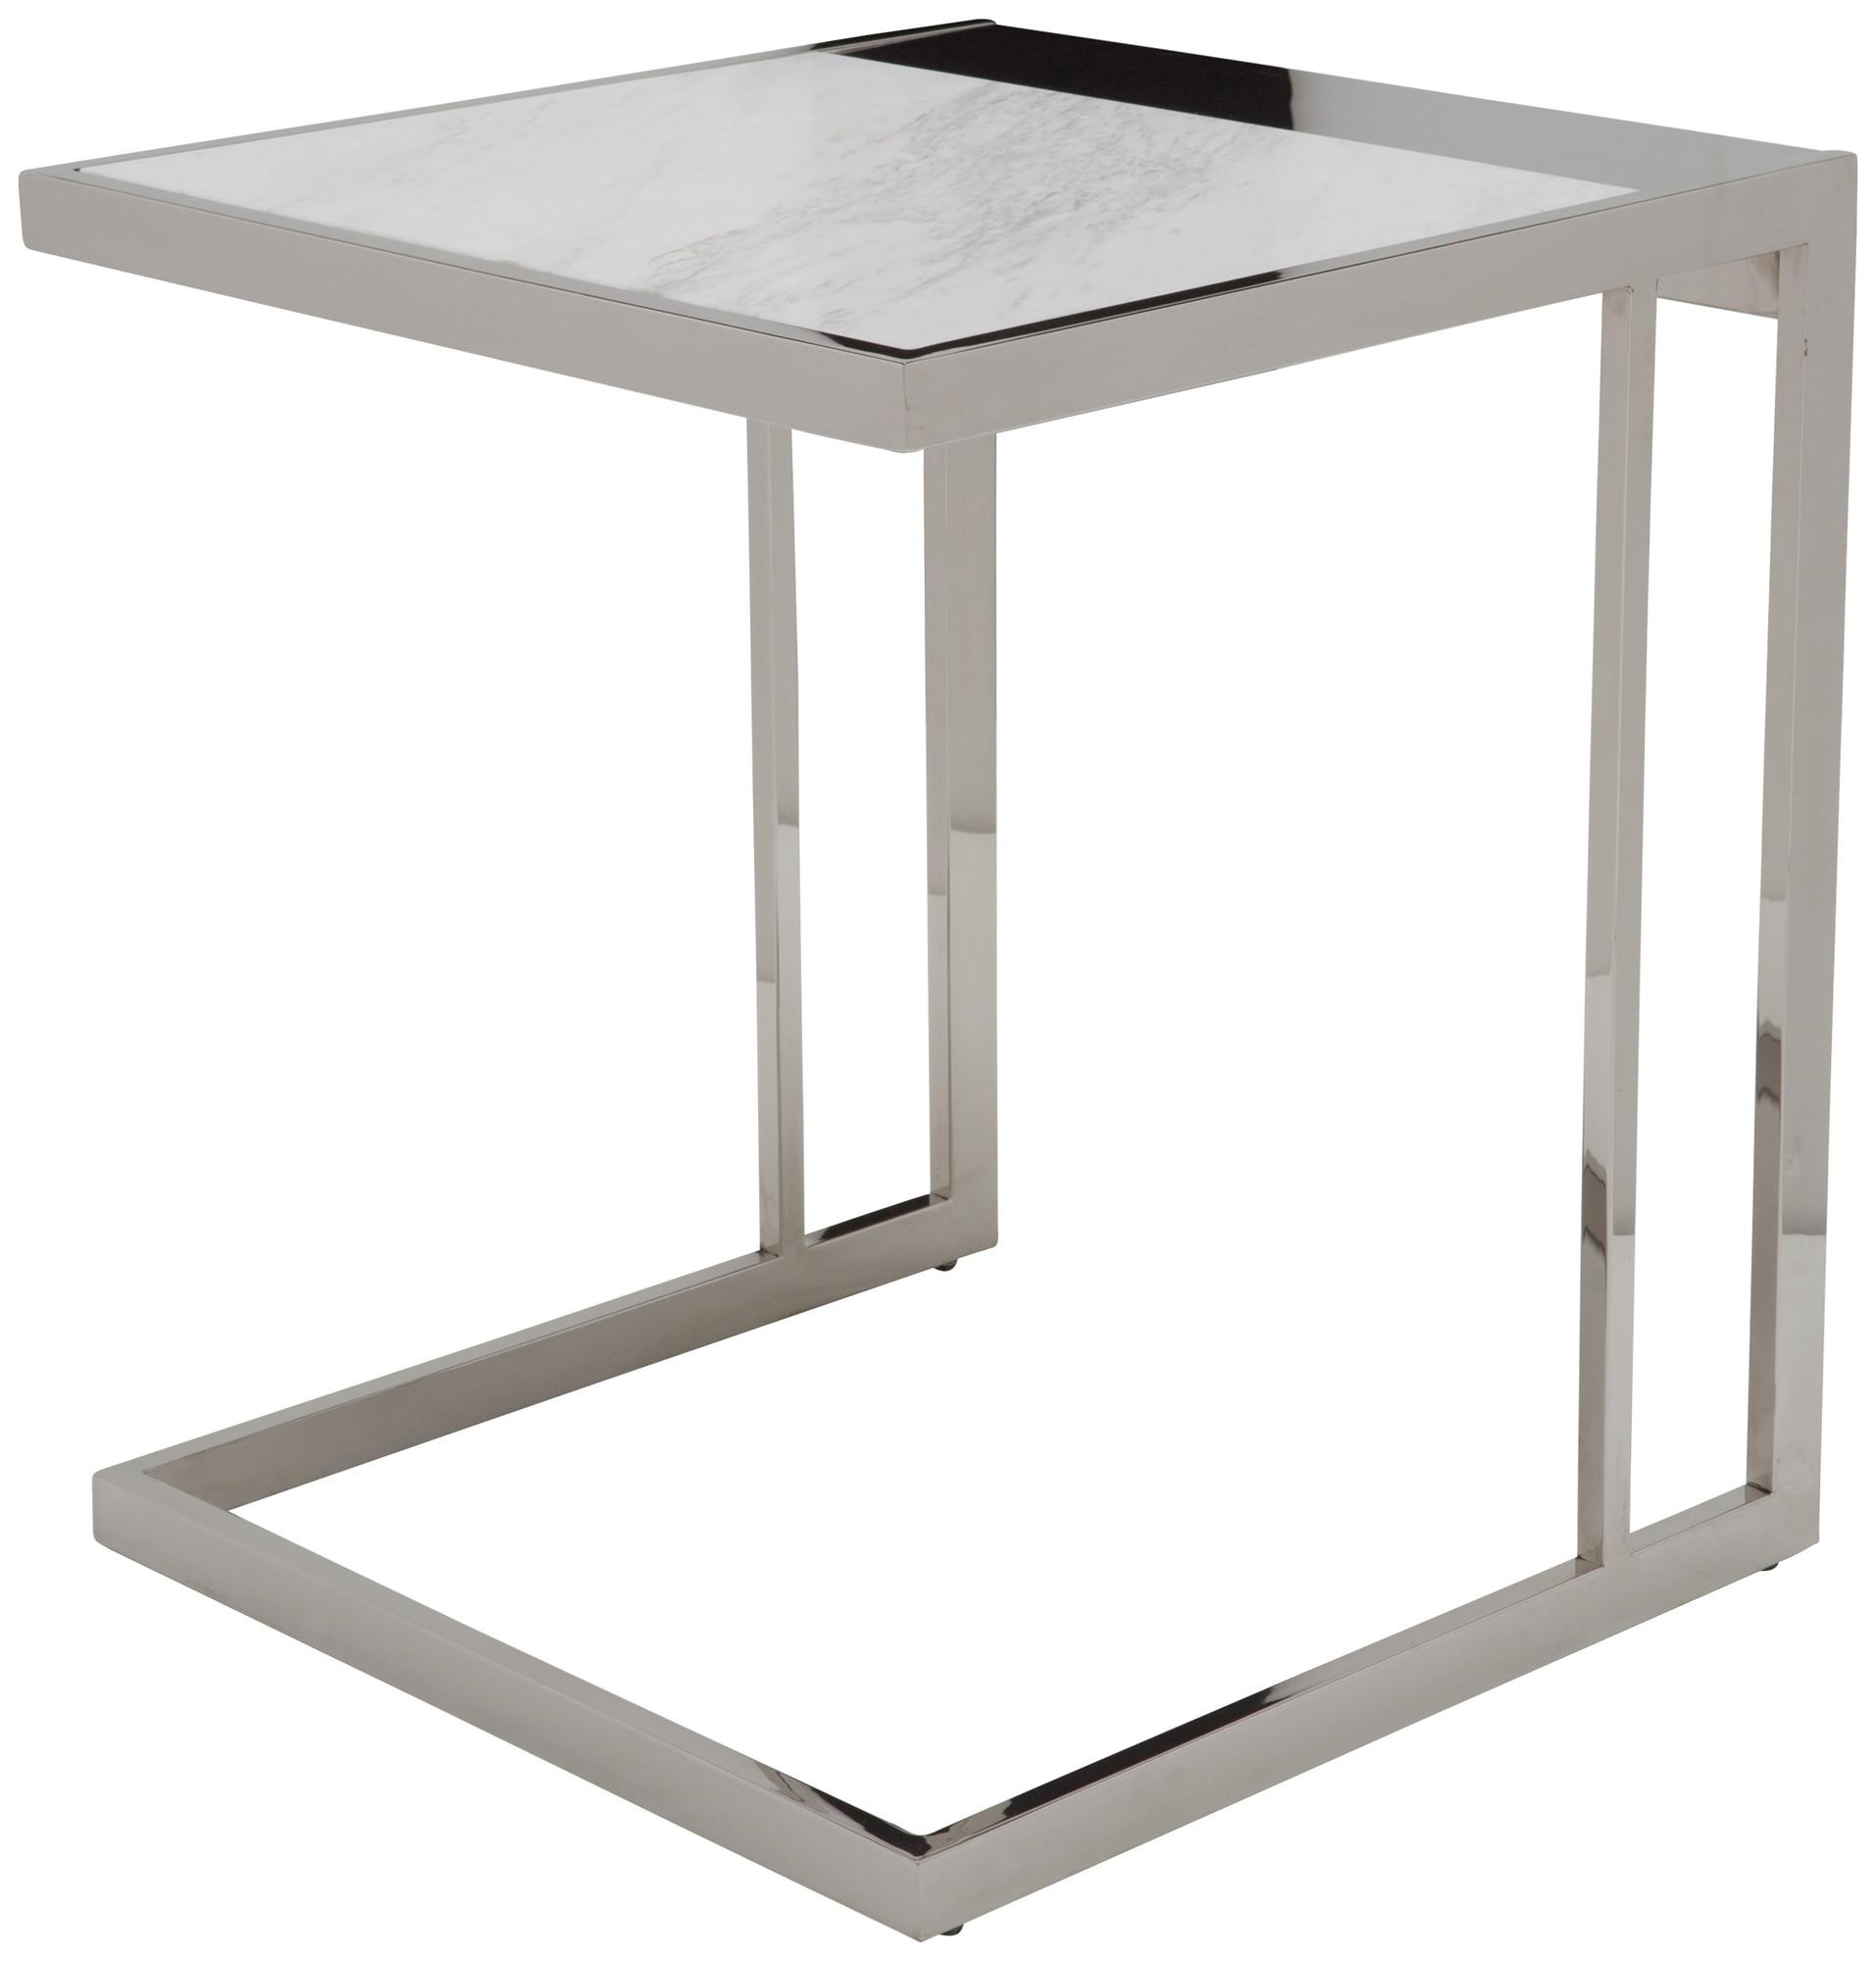 ethan-end-table-white-marble.jpg